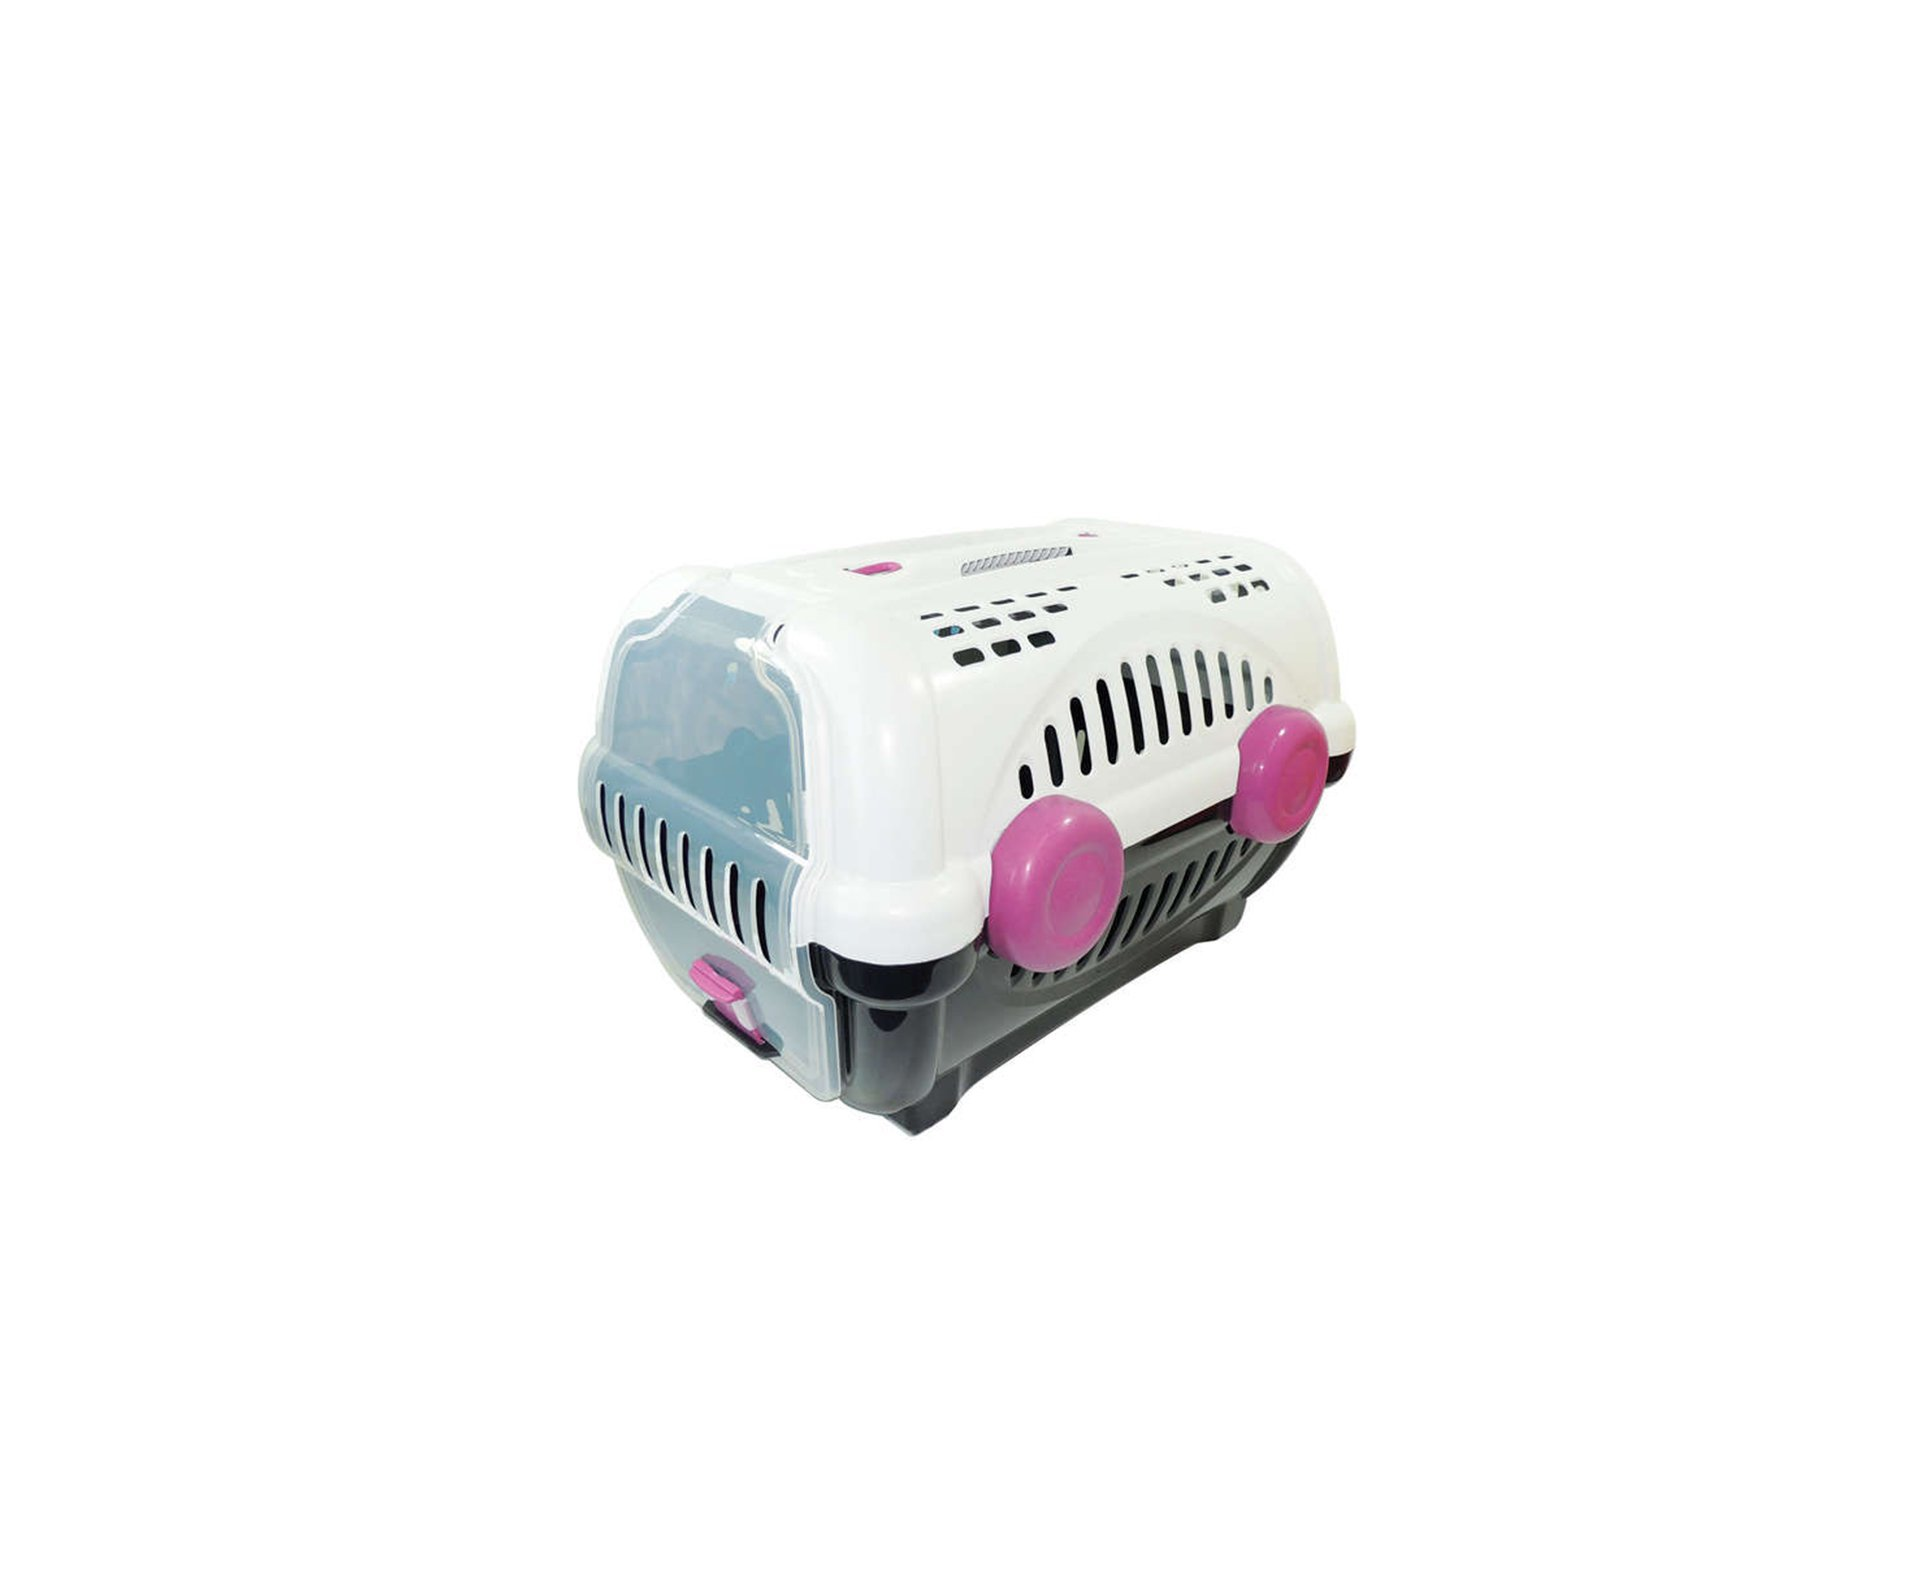 Caixa De Transporte Luxo N1 - Branca/rosa - Furacãopet